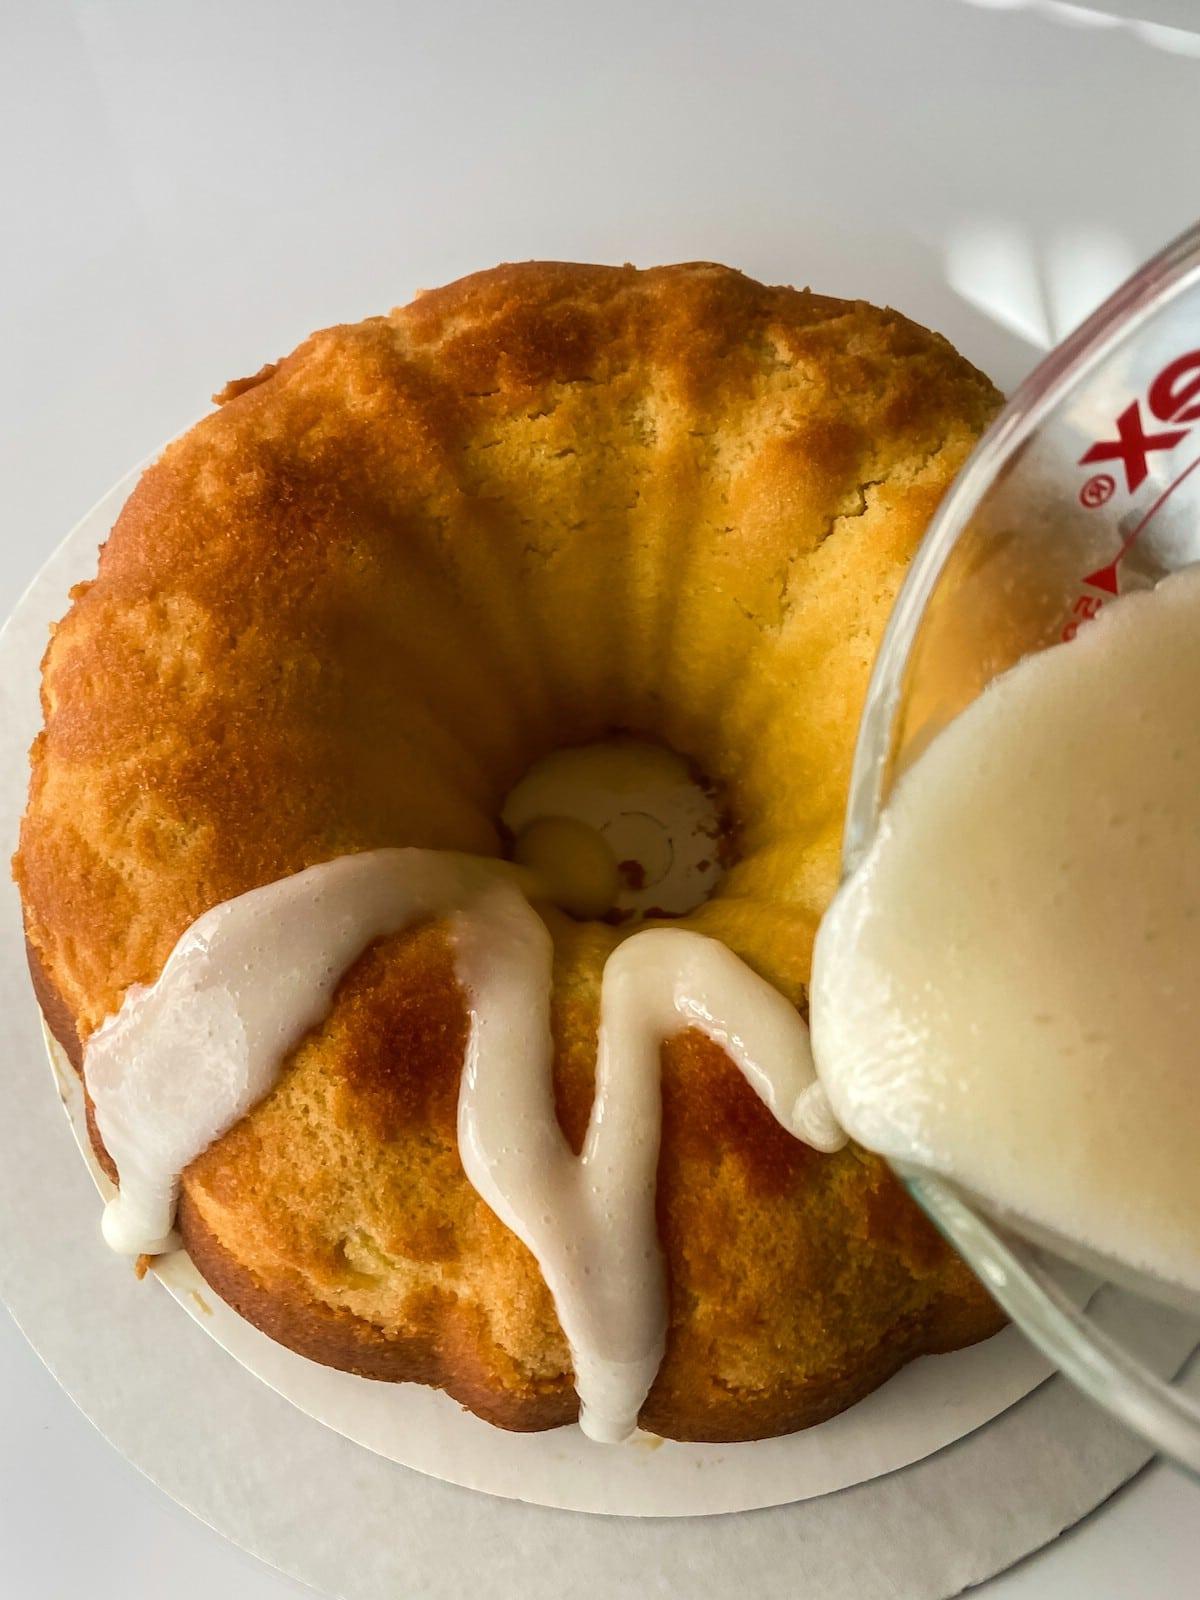 Pouring glaze over bundt cake